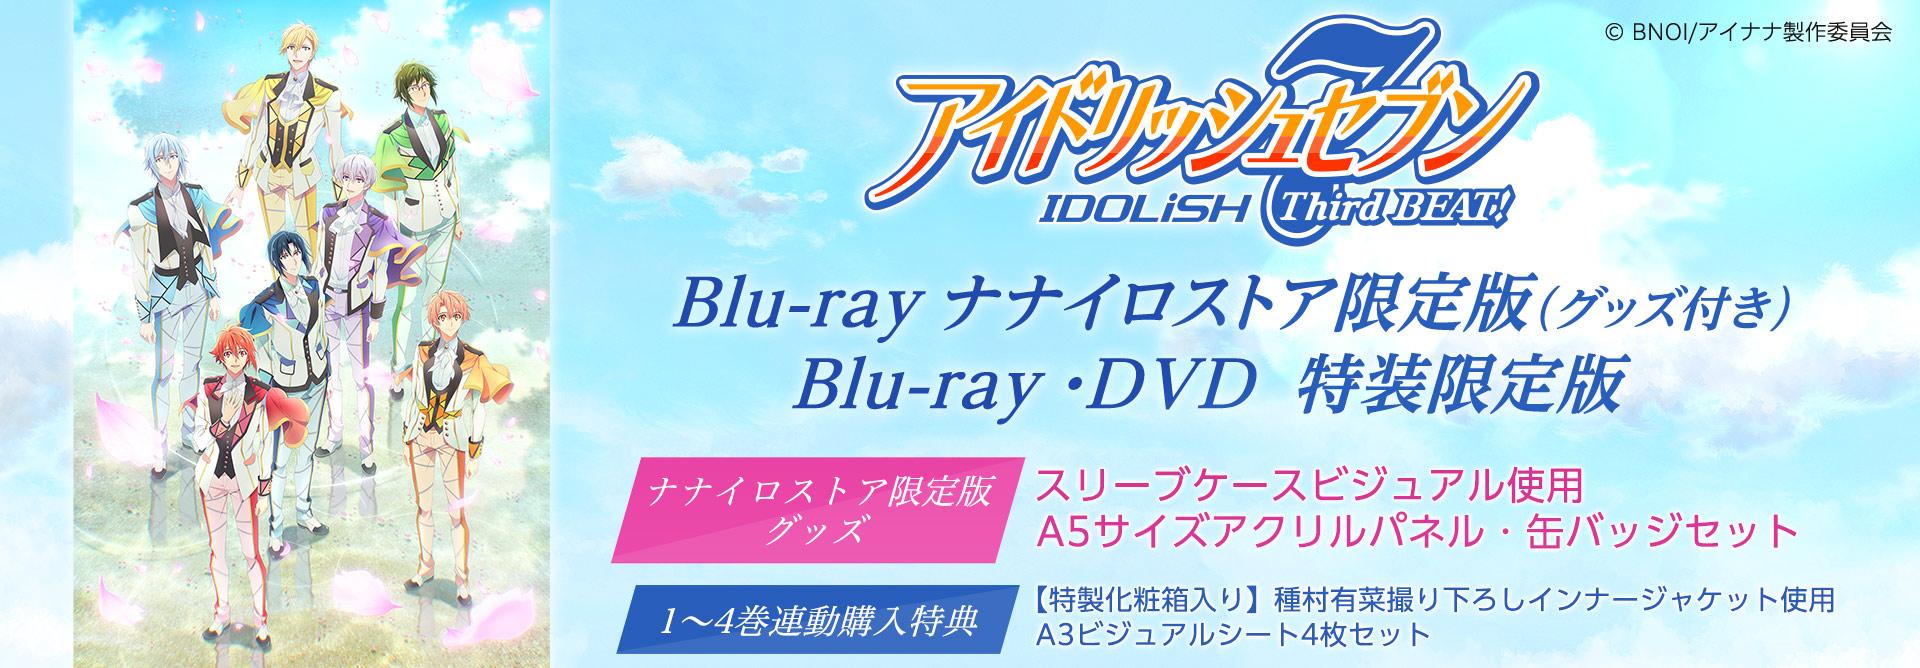 TVアニメ『アイドリッシュセブン Third BEAT!』Blu-rayナナイロストア限定版(特装限定版+特別グッズ) /Blu-ray・DVD 特装限定版